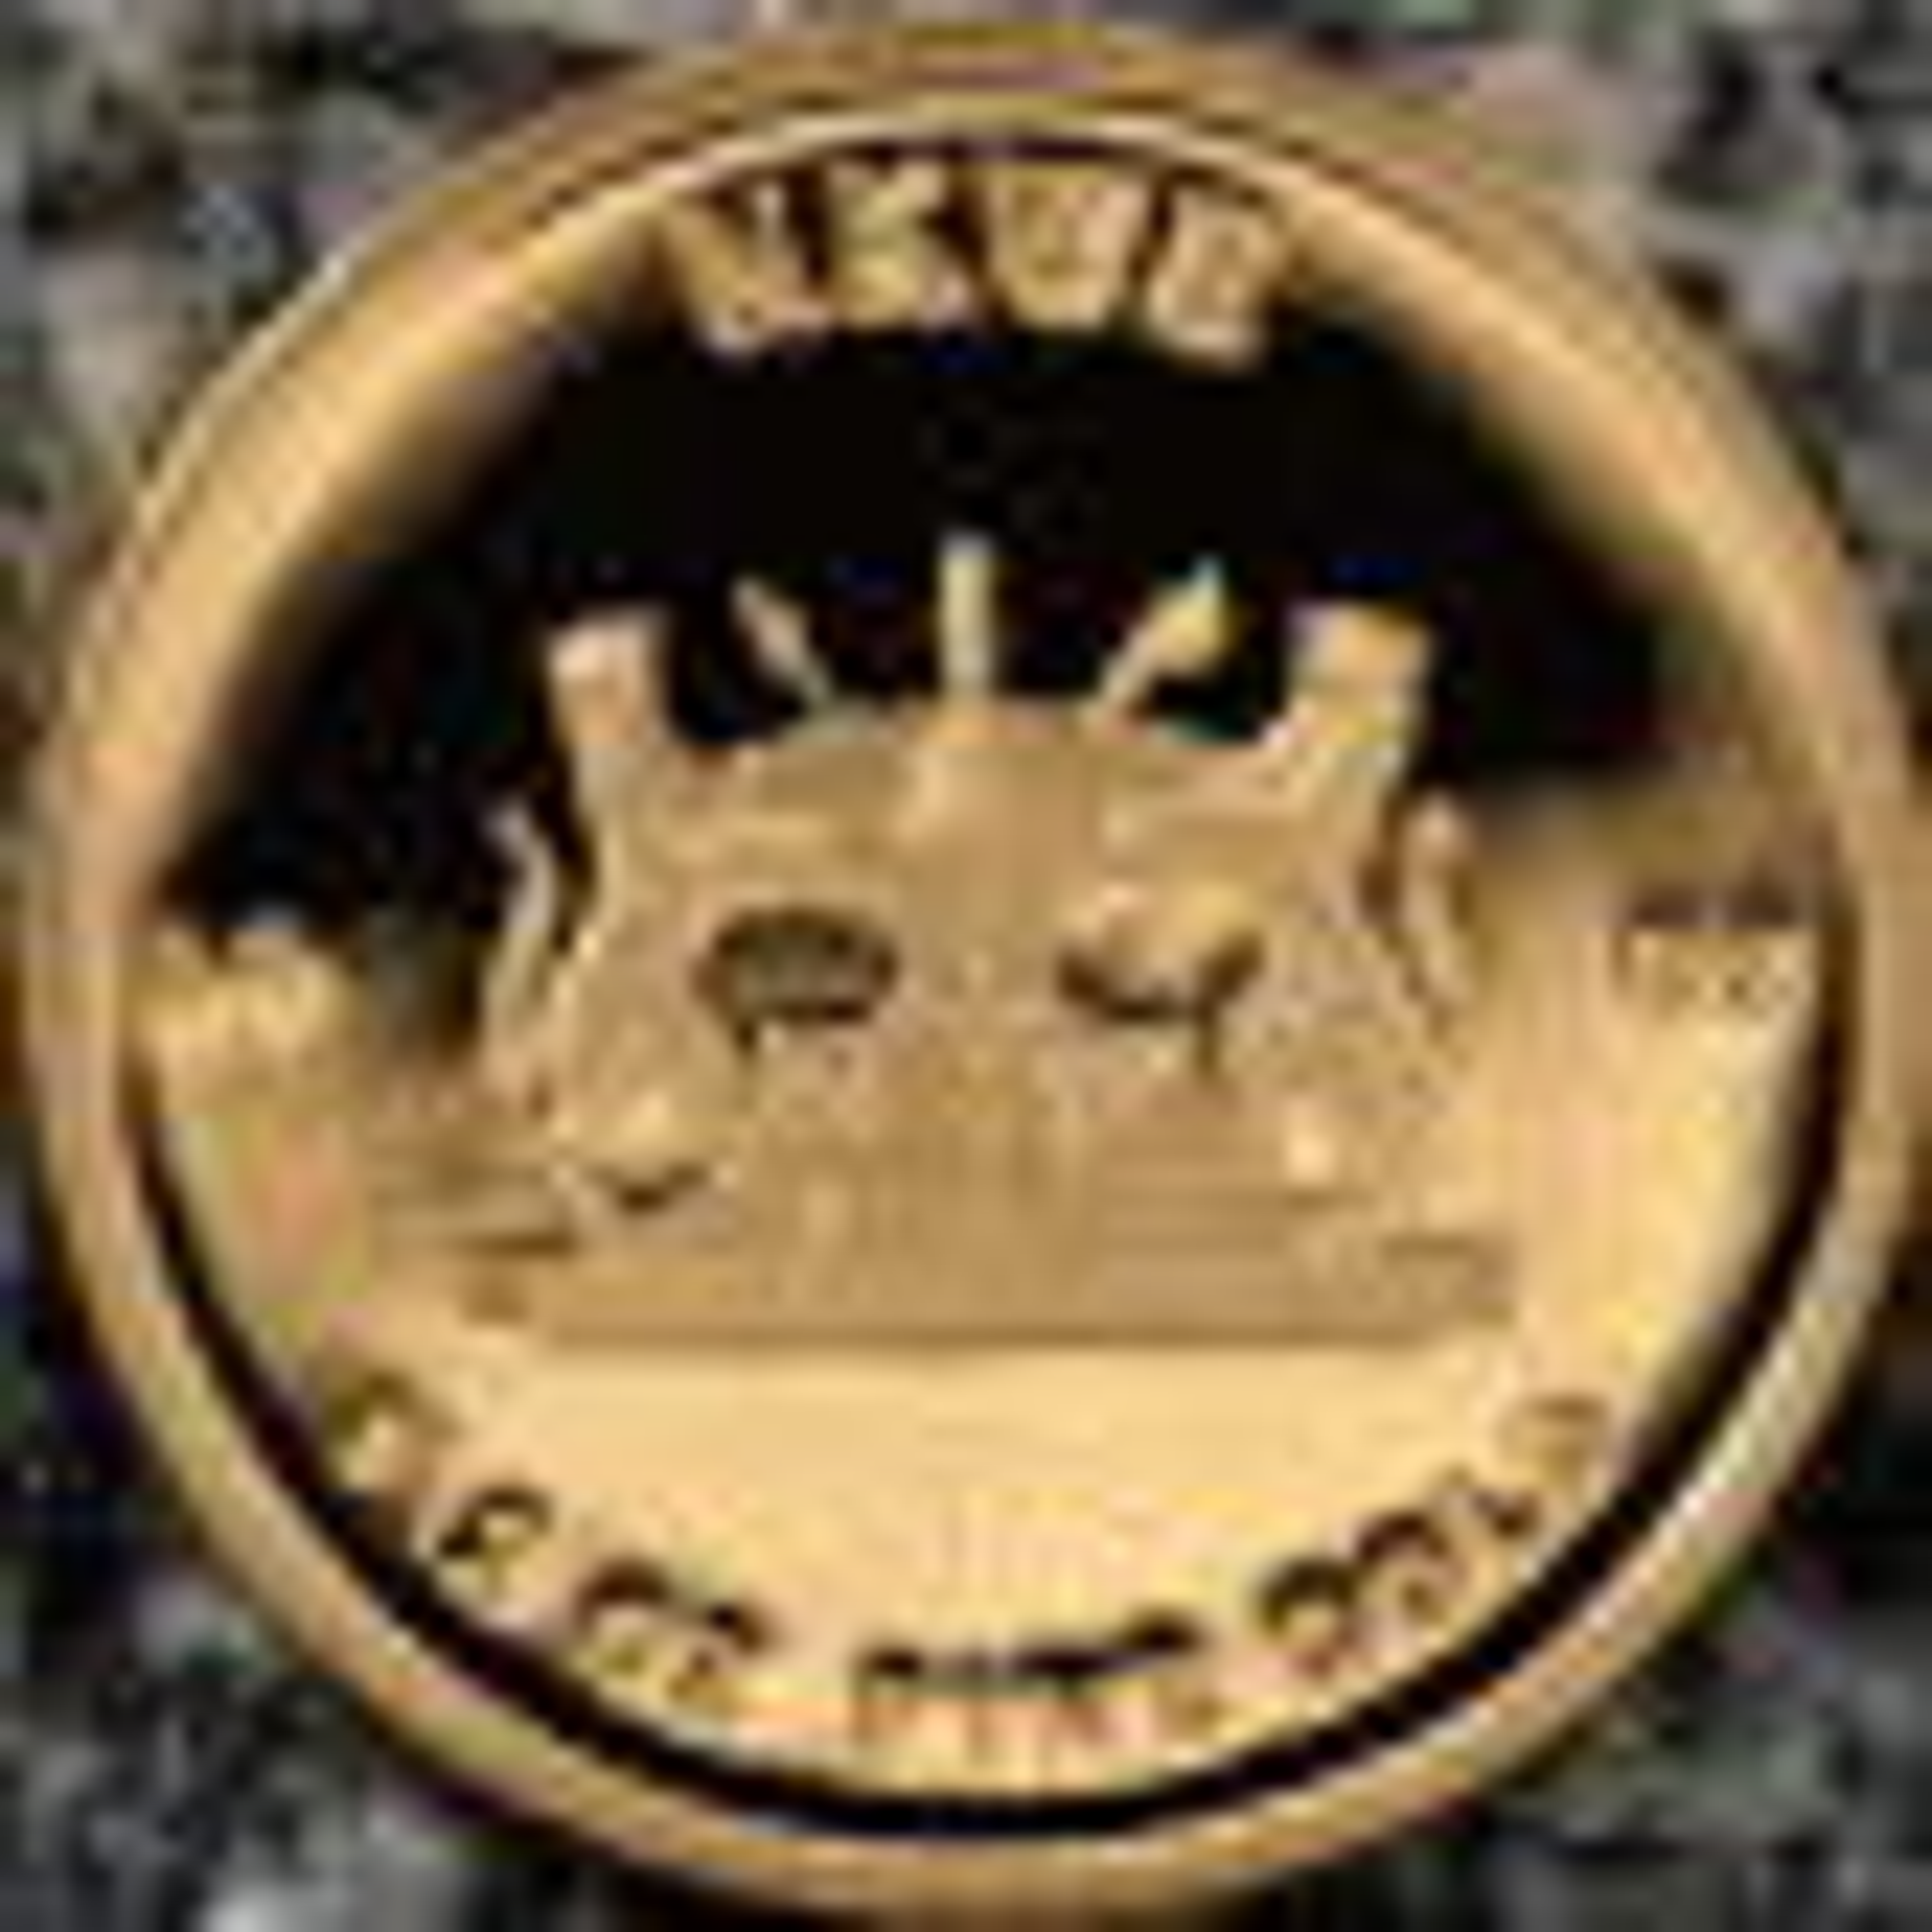 1/2 Troy ounce gouden munt NKWE Bophuthatswana achterzijde